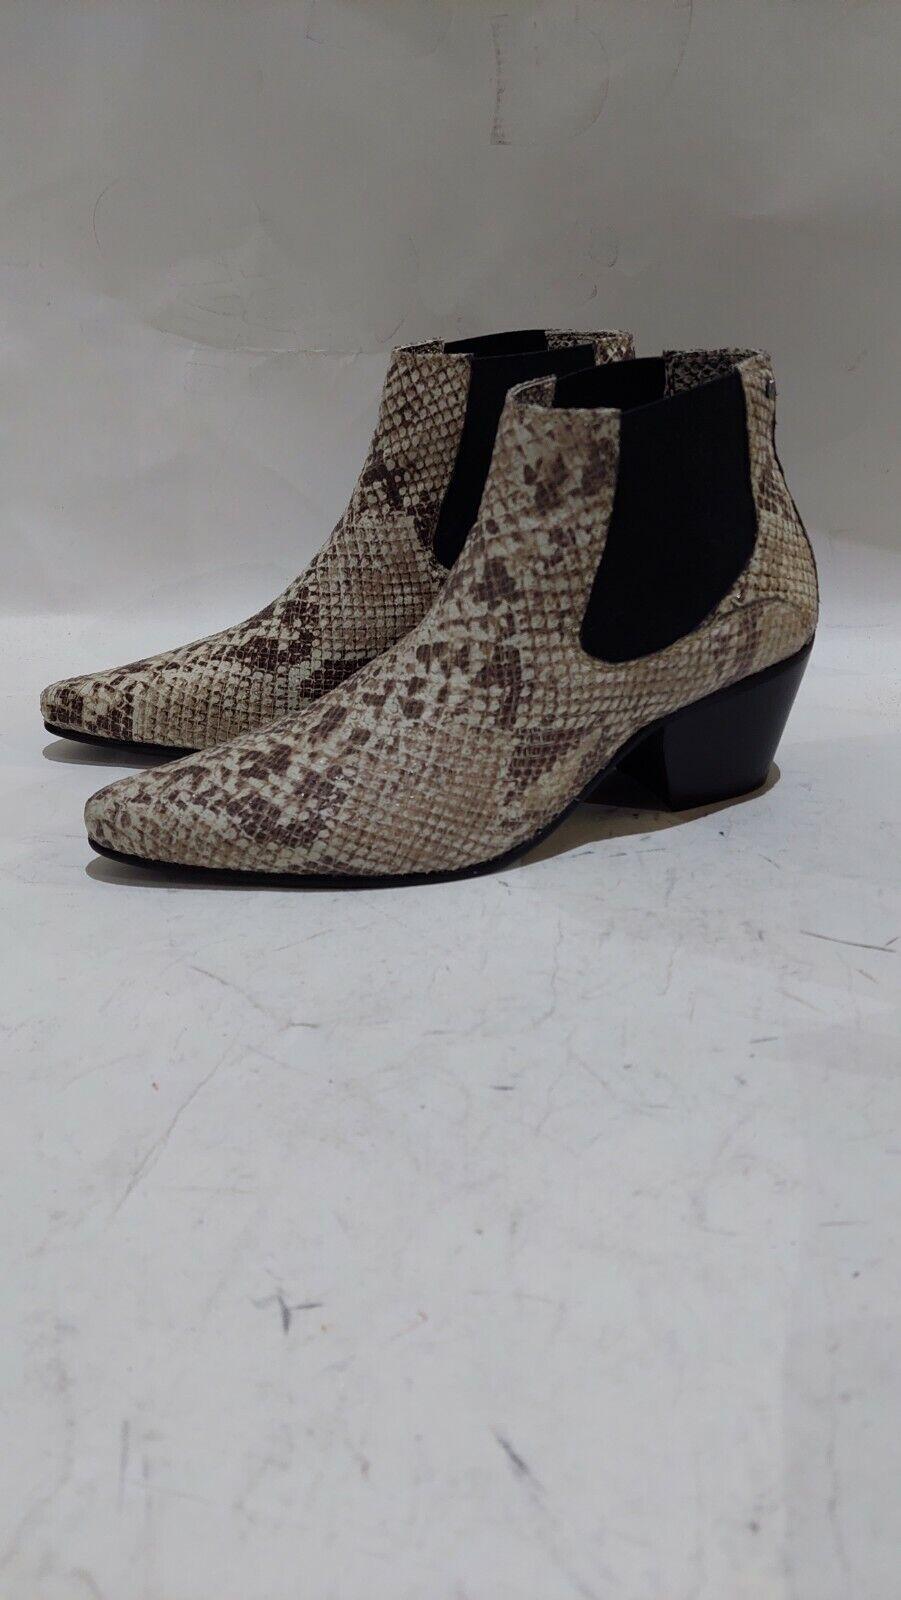 Club Cubano McCARTNEY Mens Snake Winklepicker Cuban Heel Boots Python UK 7#747